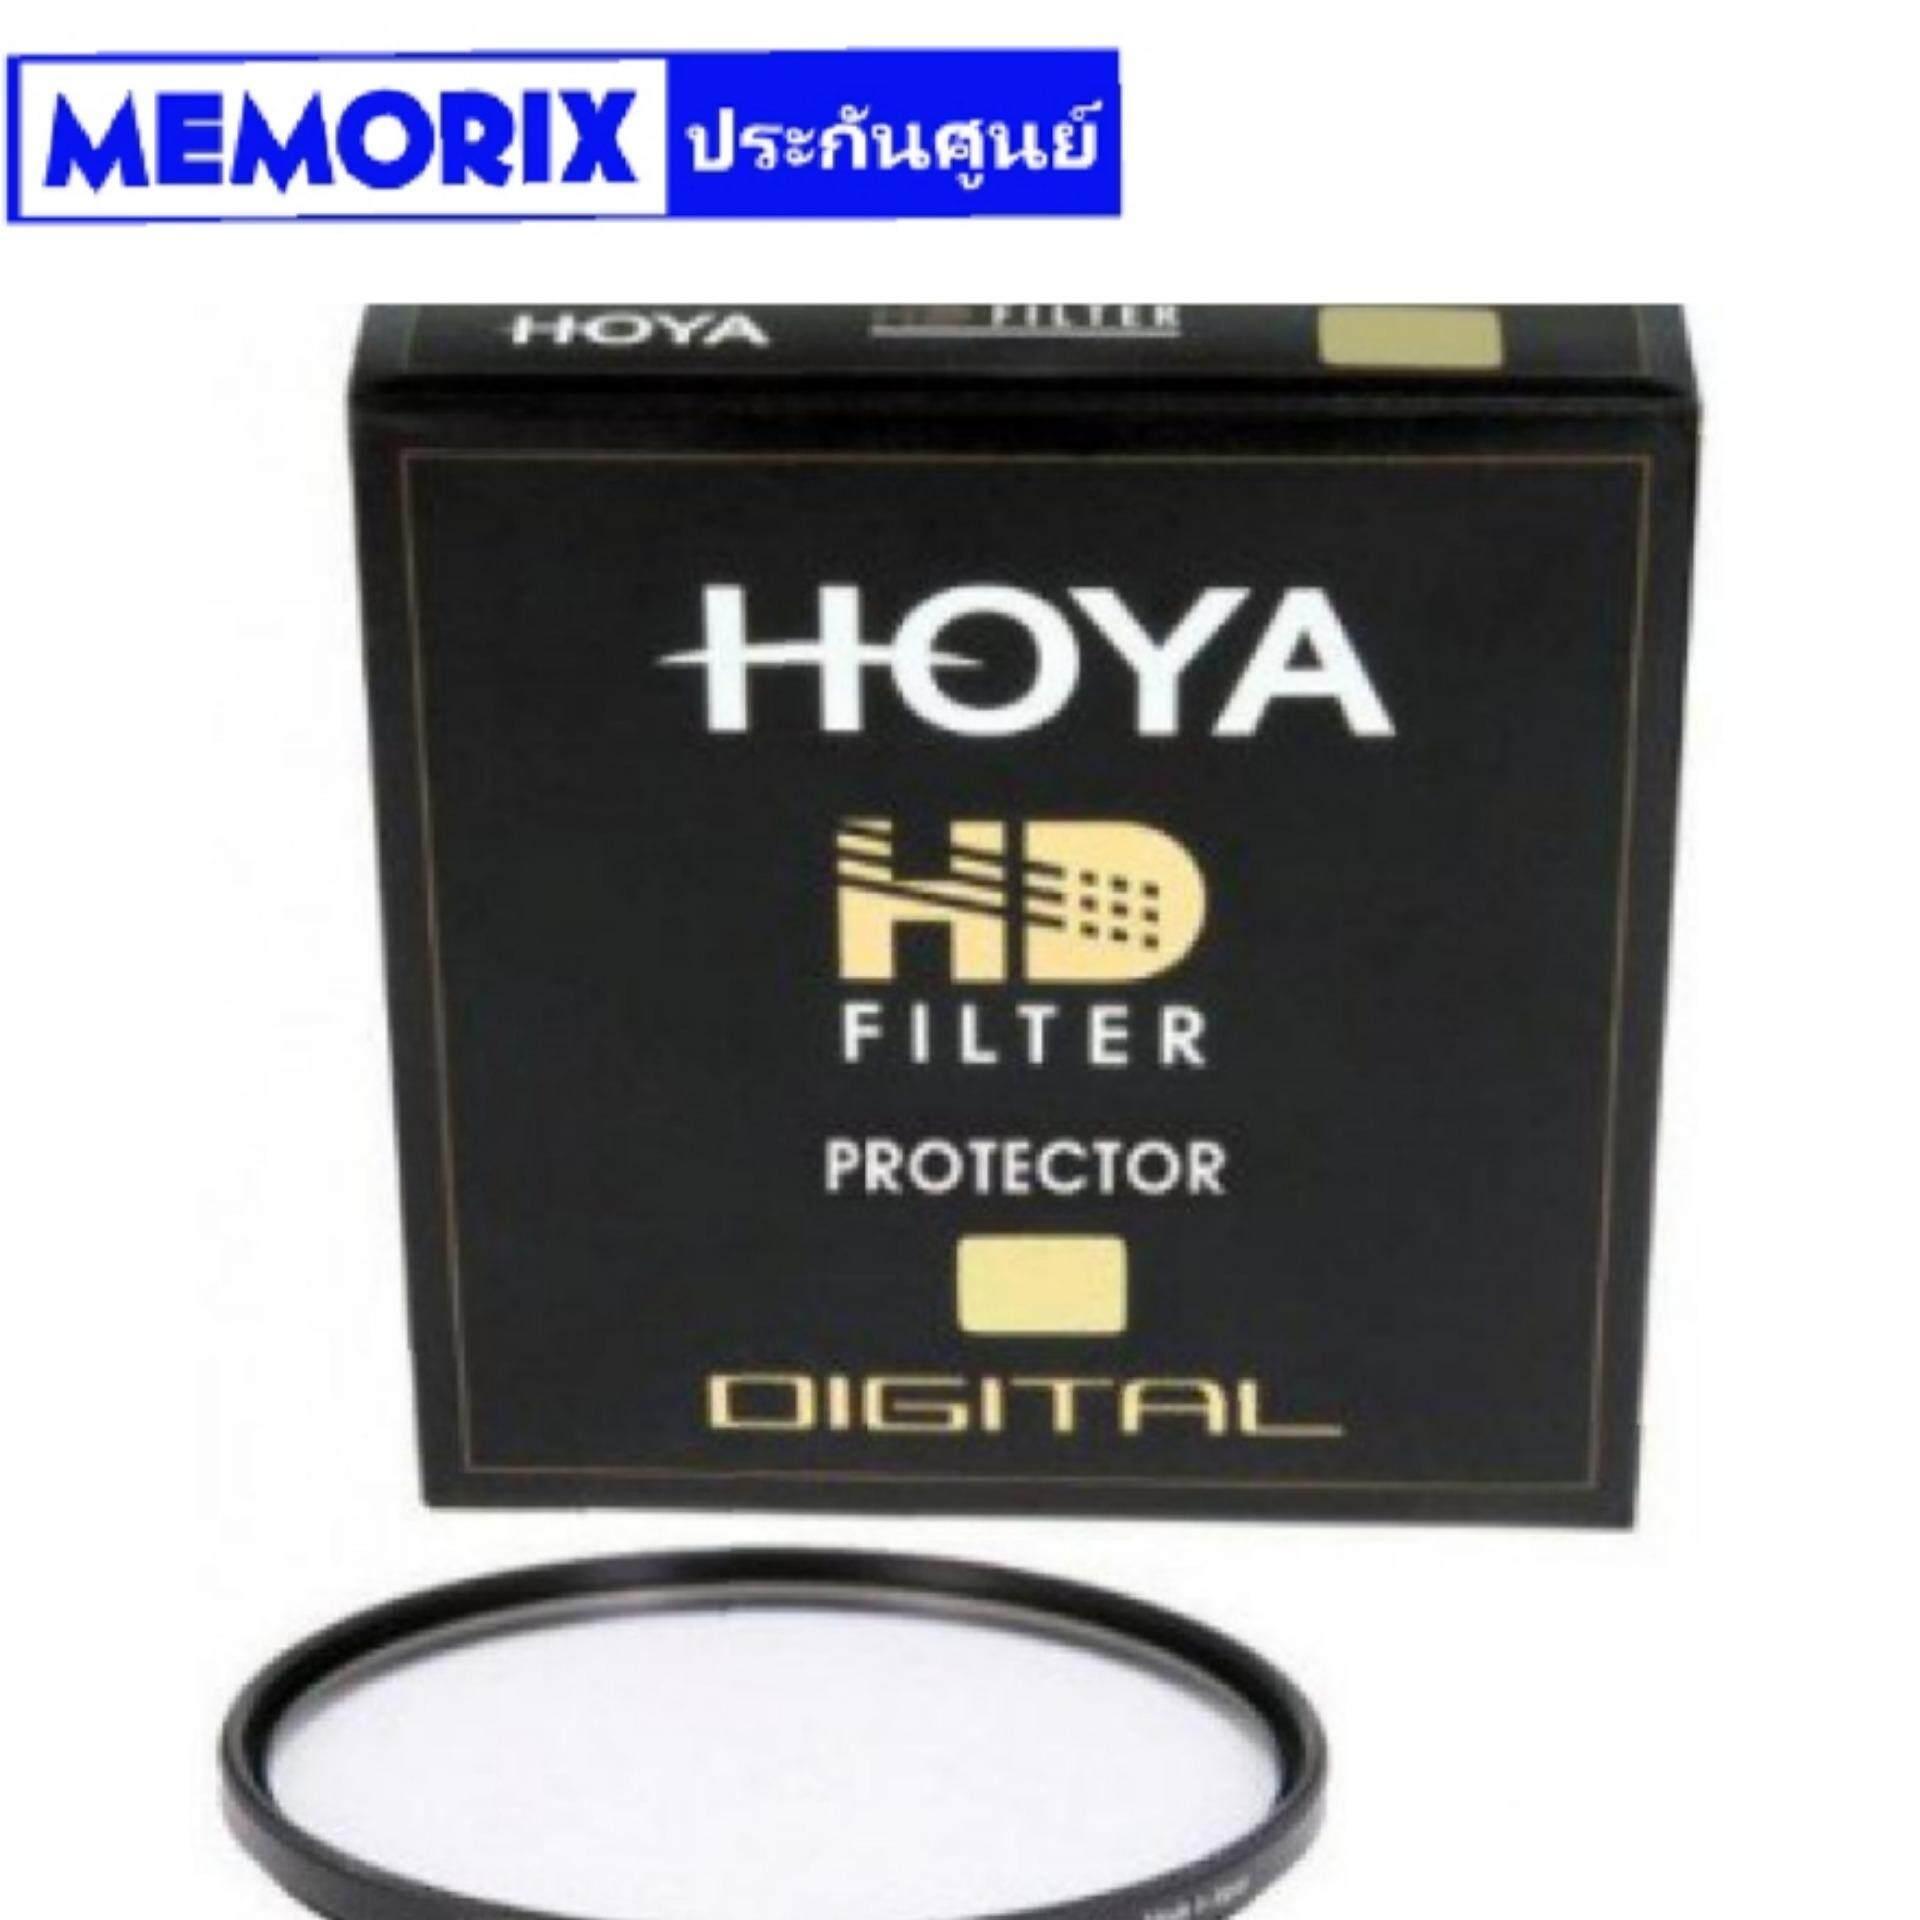 Hoya 49 Mm Filter Protector Hd 49mm.